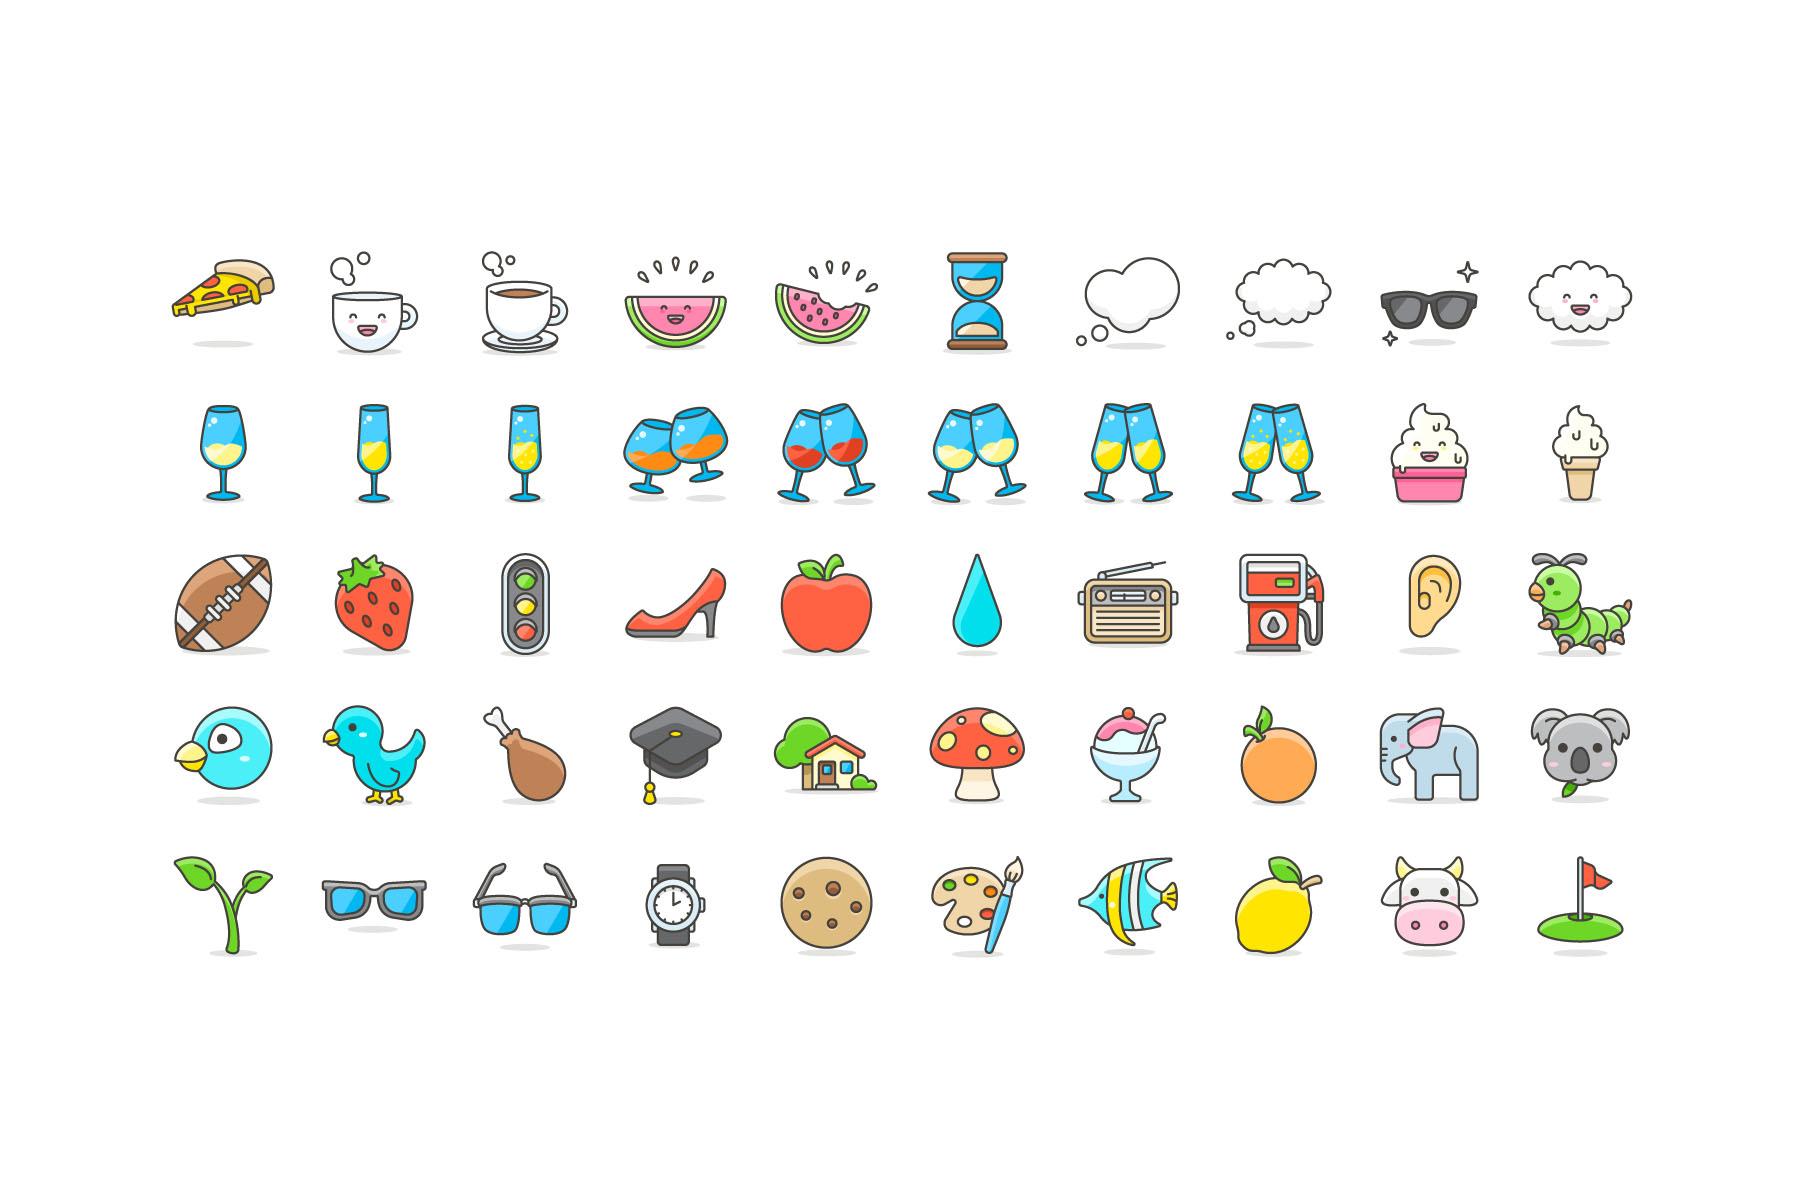 100 Free Vector Cute Emoji